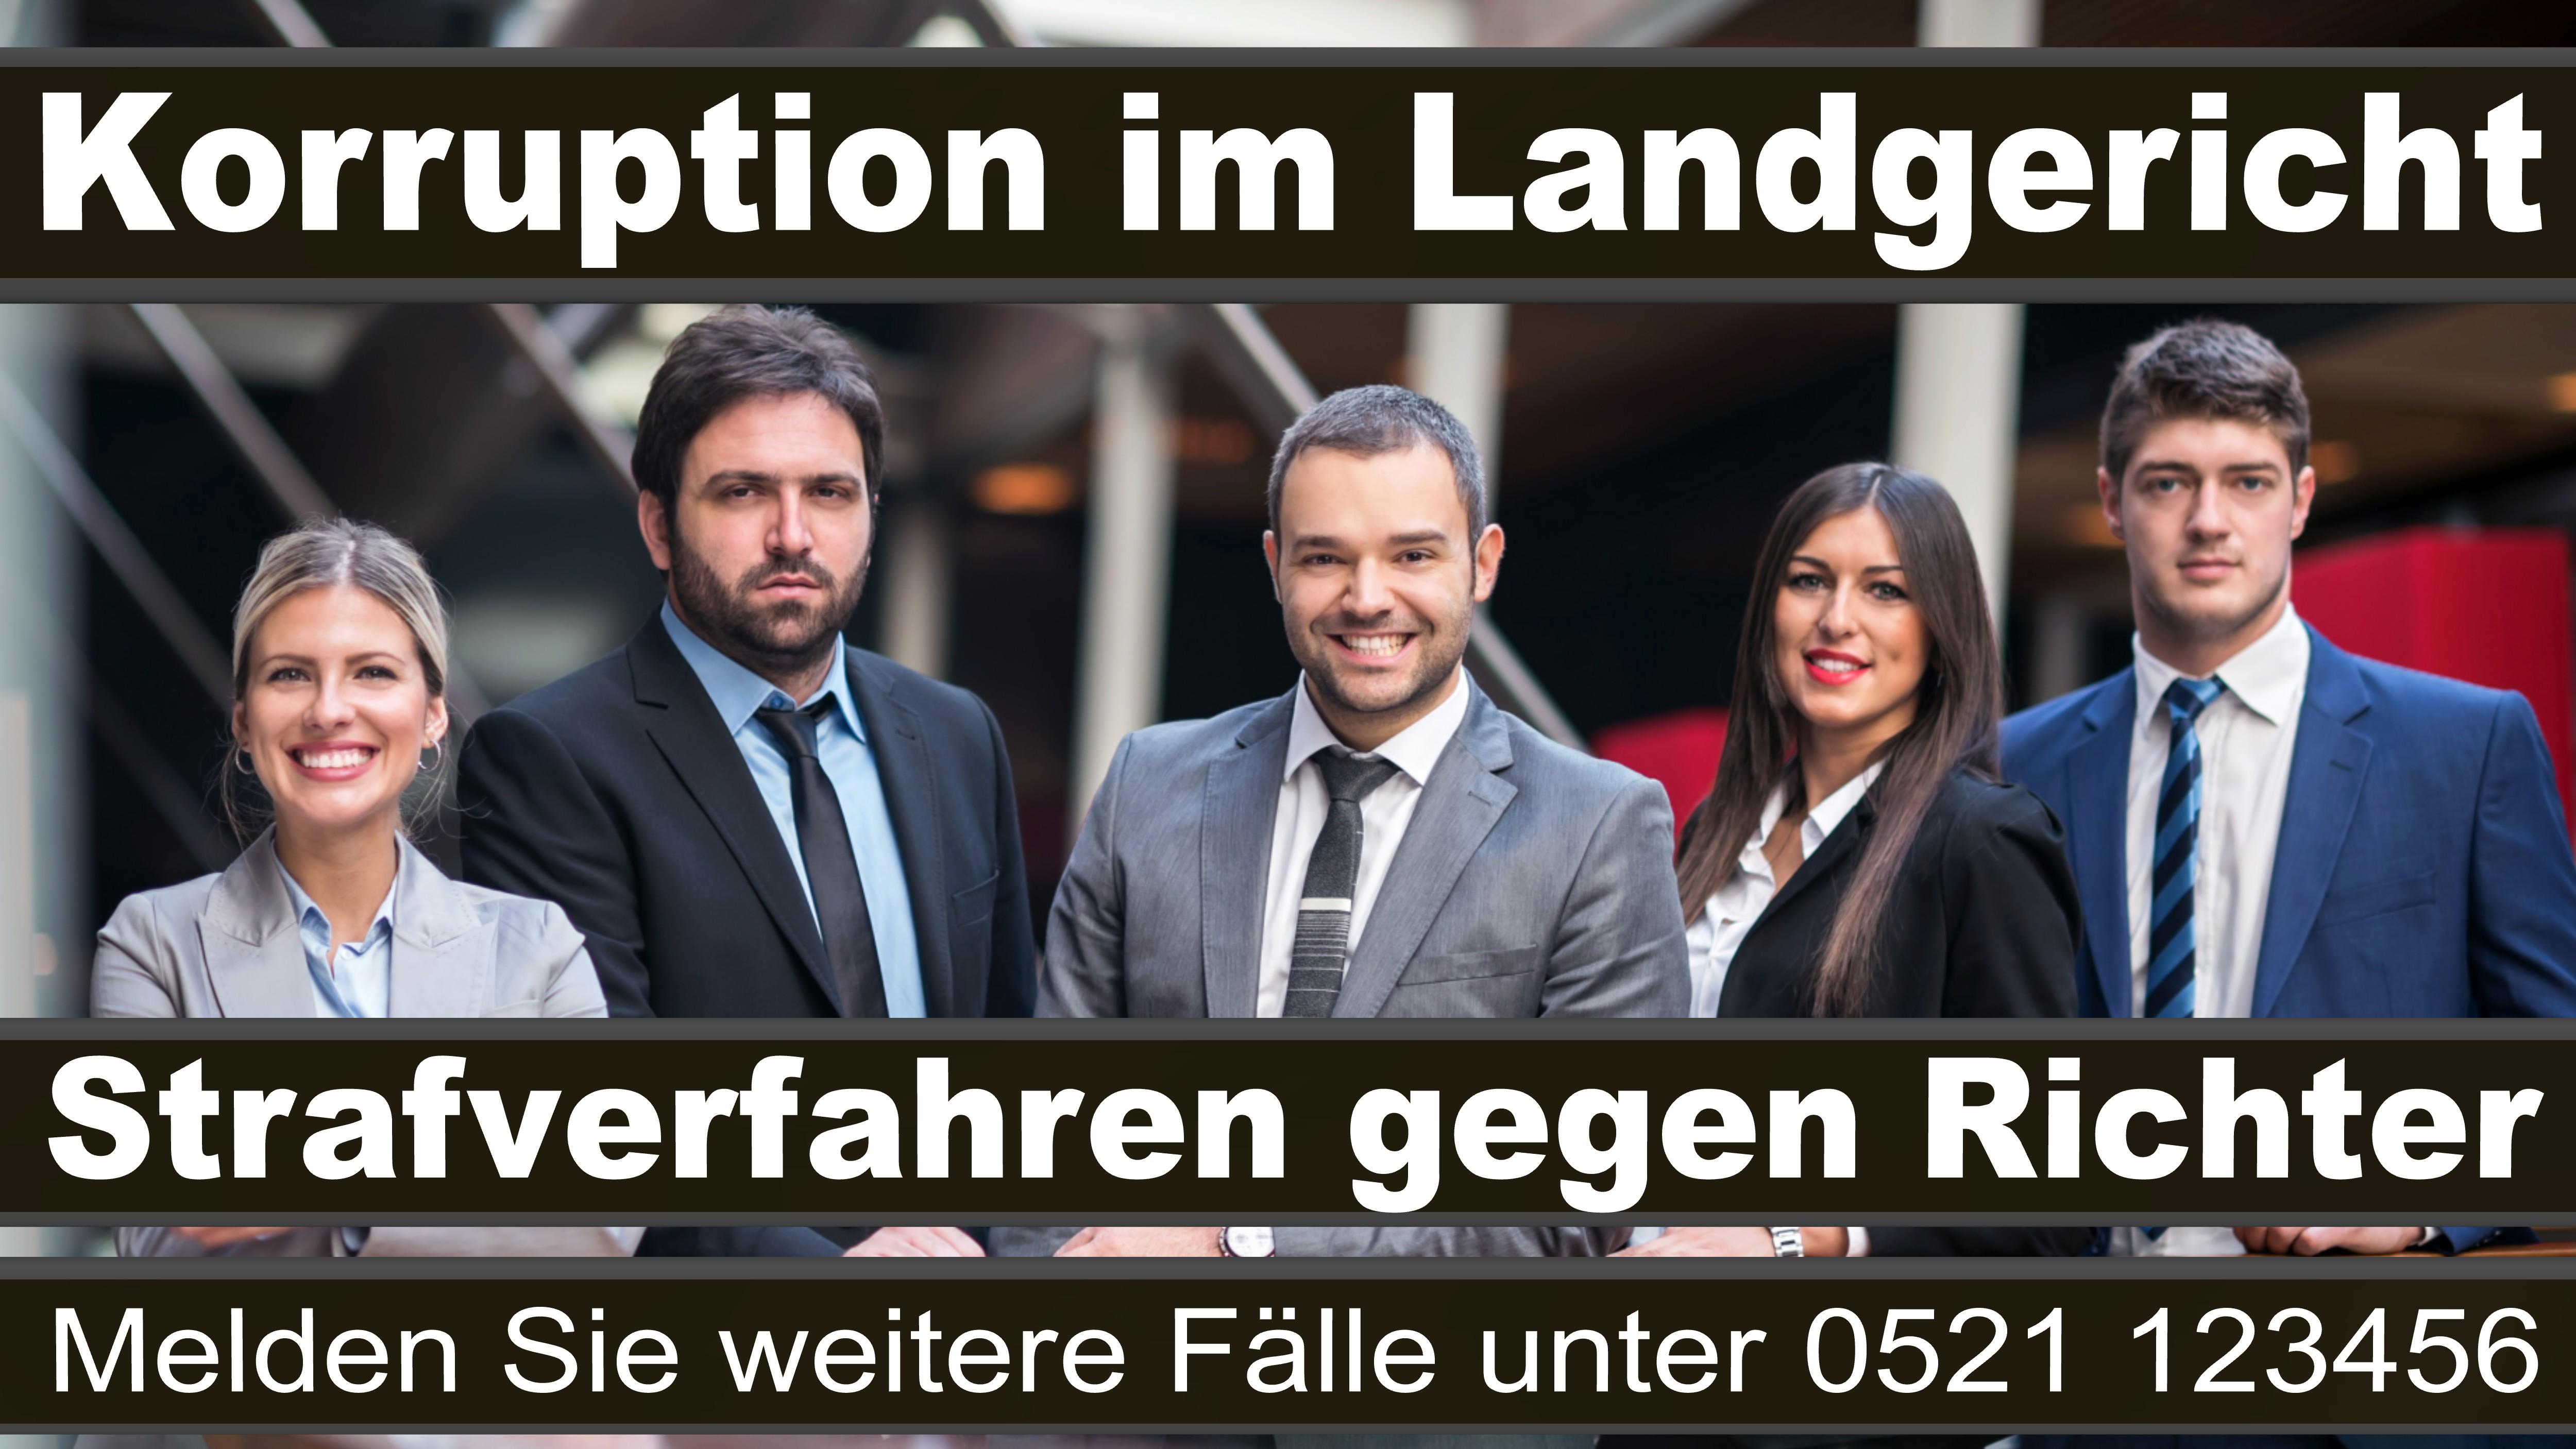 Generalstaatsanwaltschaft Köln